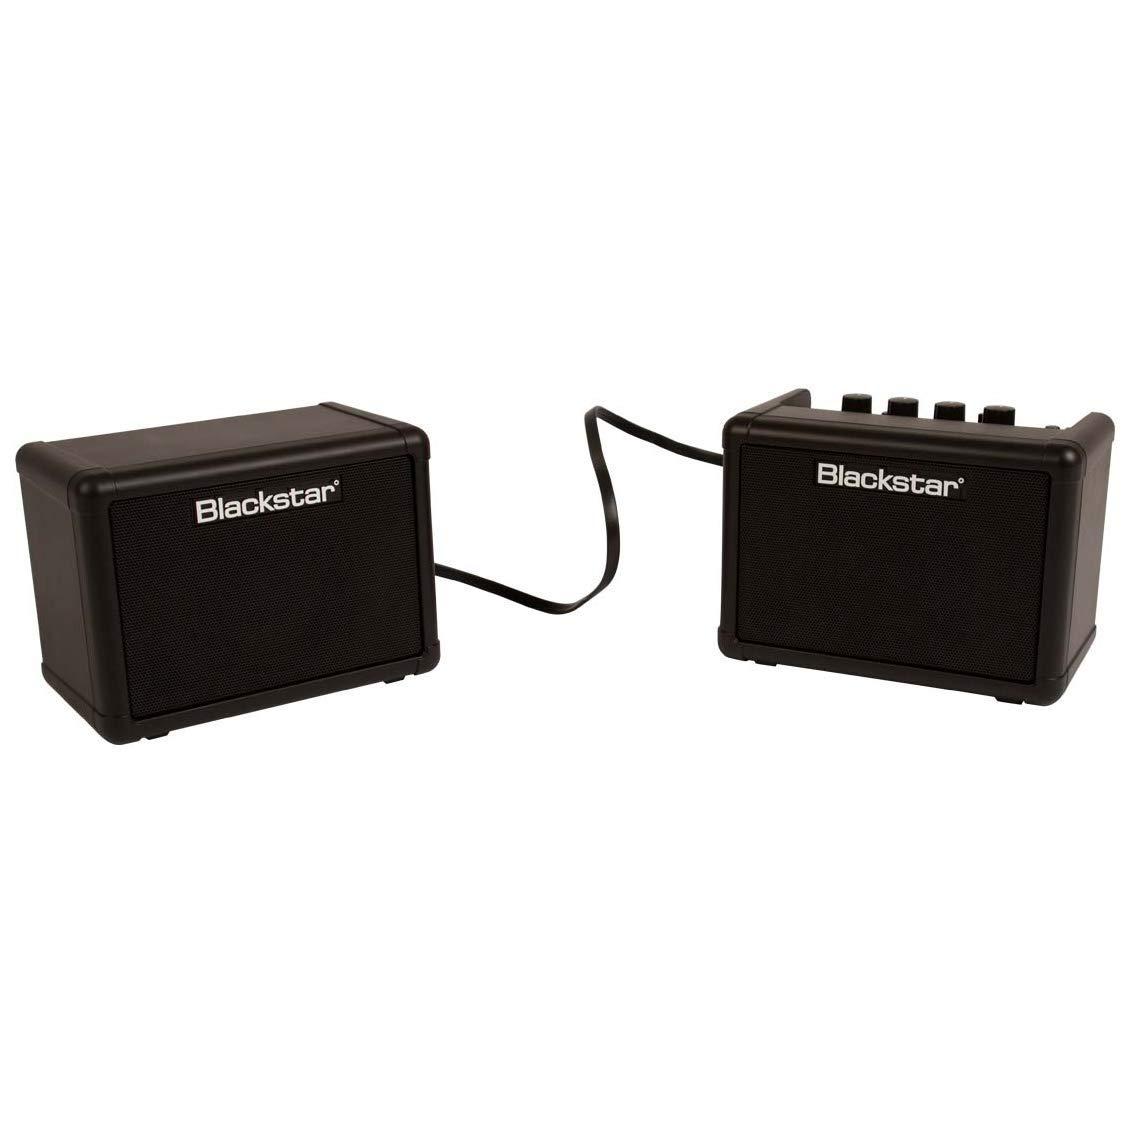 Blackstar FLY PACK Stereo Guitar Mini Amplifier 3 watts